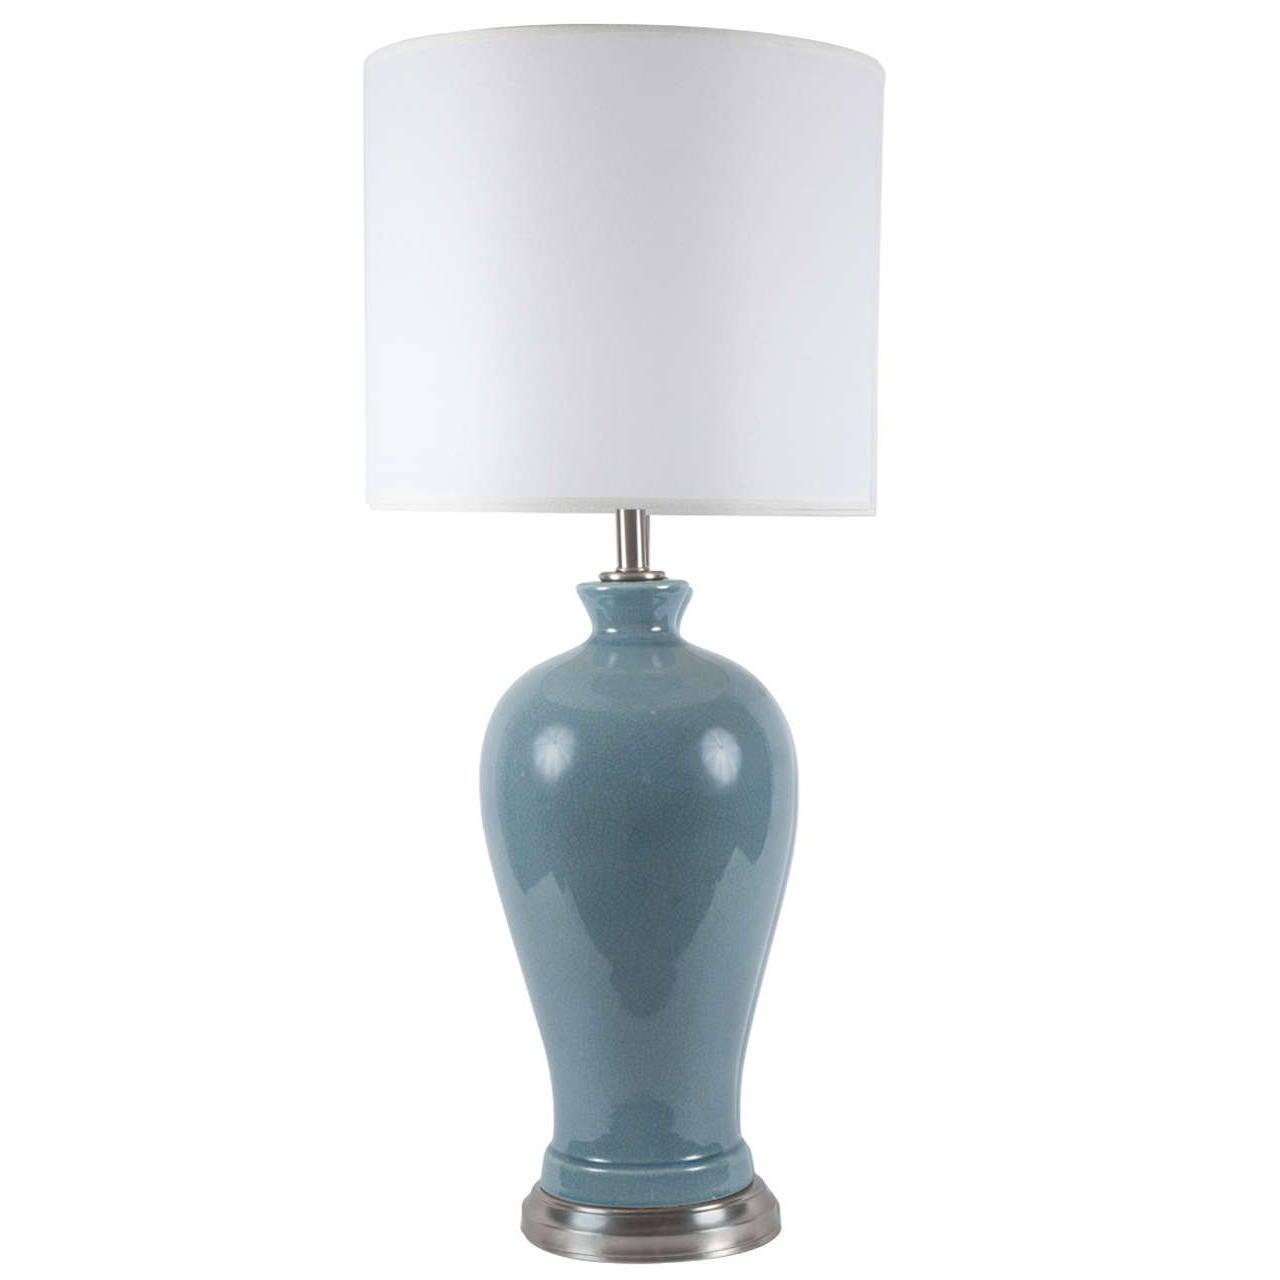 Blue Grey Crackle Glazed Lamp by Paul Hanson